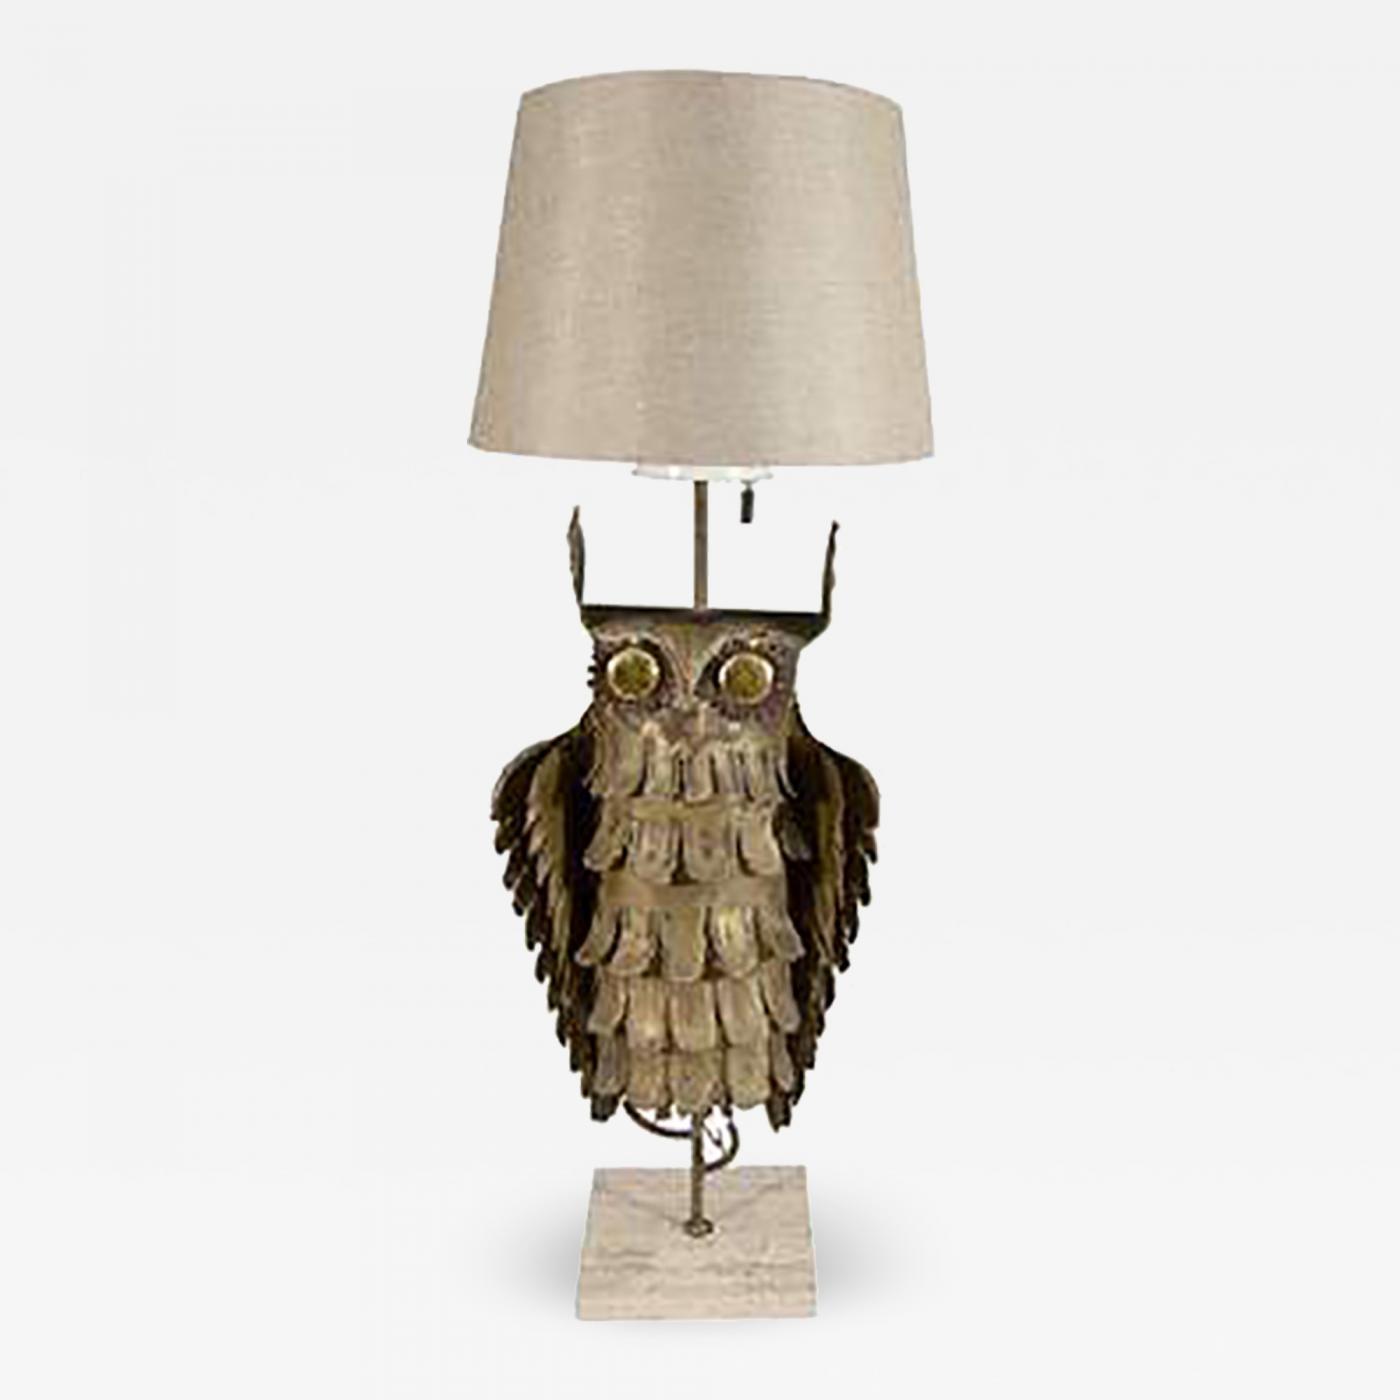 Lovely Listings / Furniture / Lighting / Table Lamps